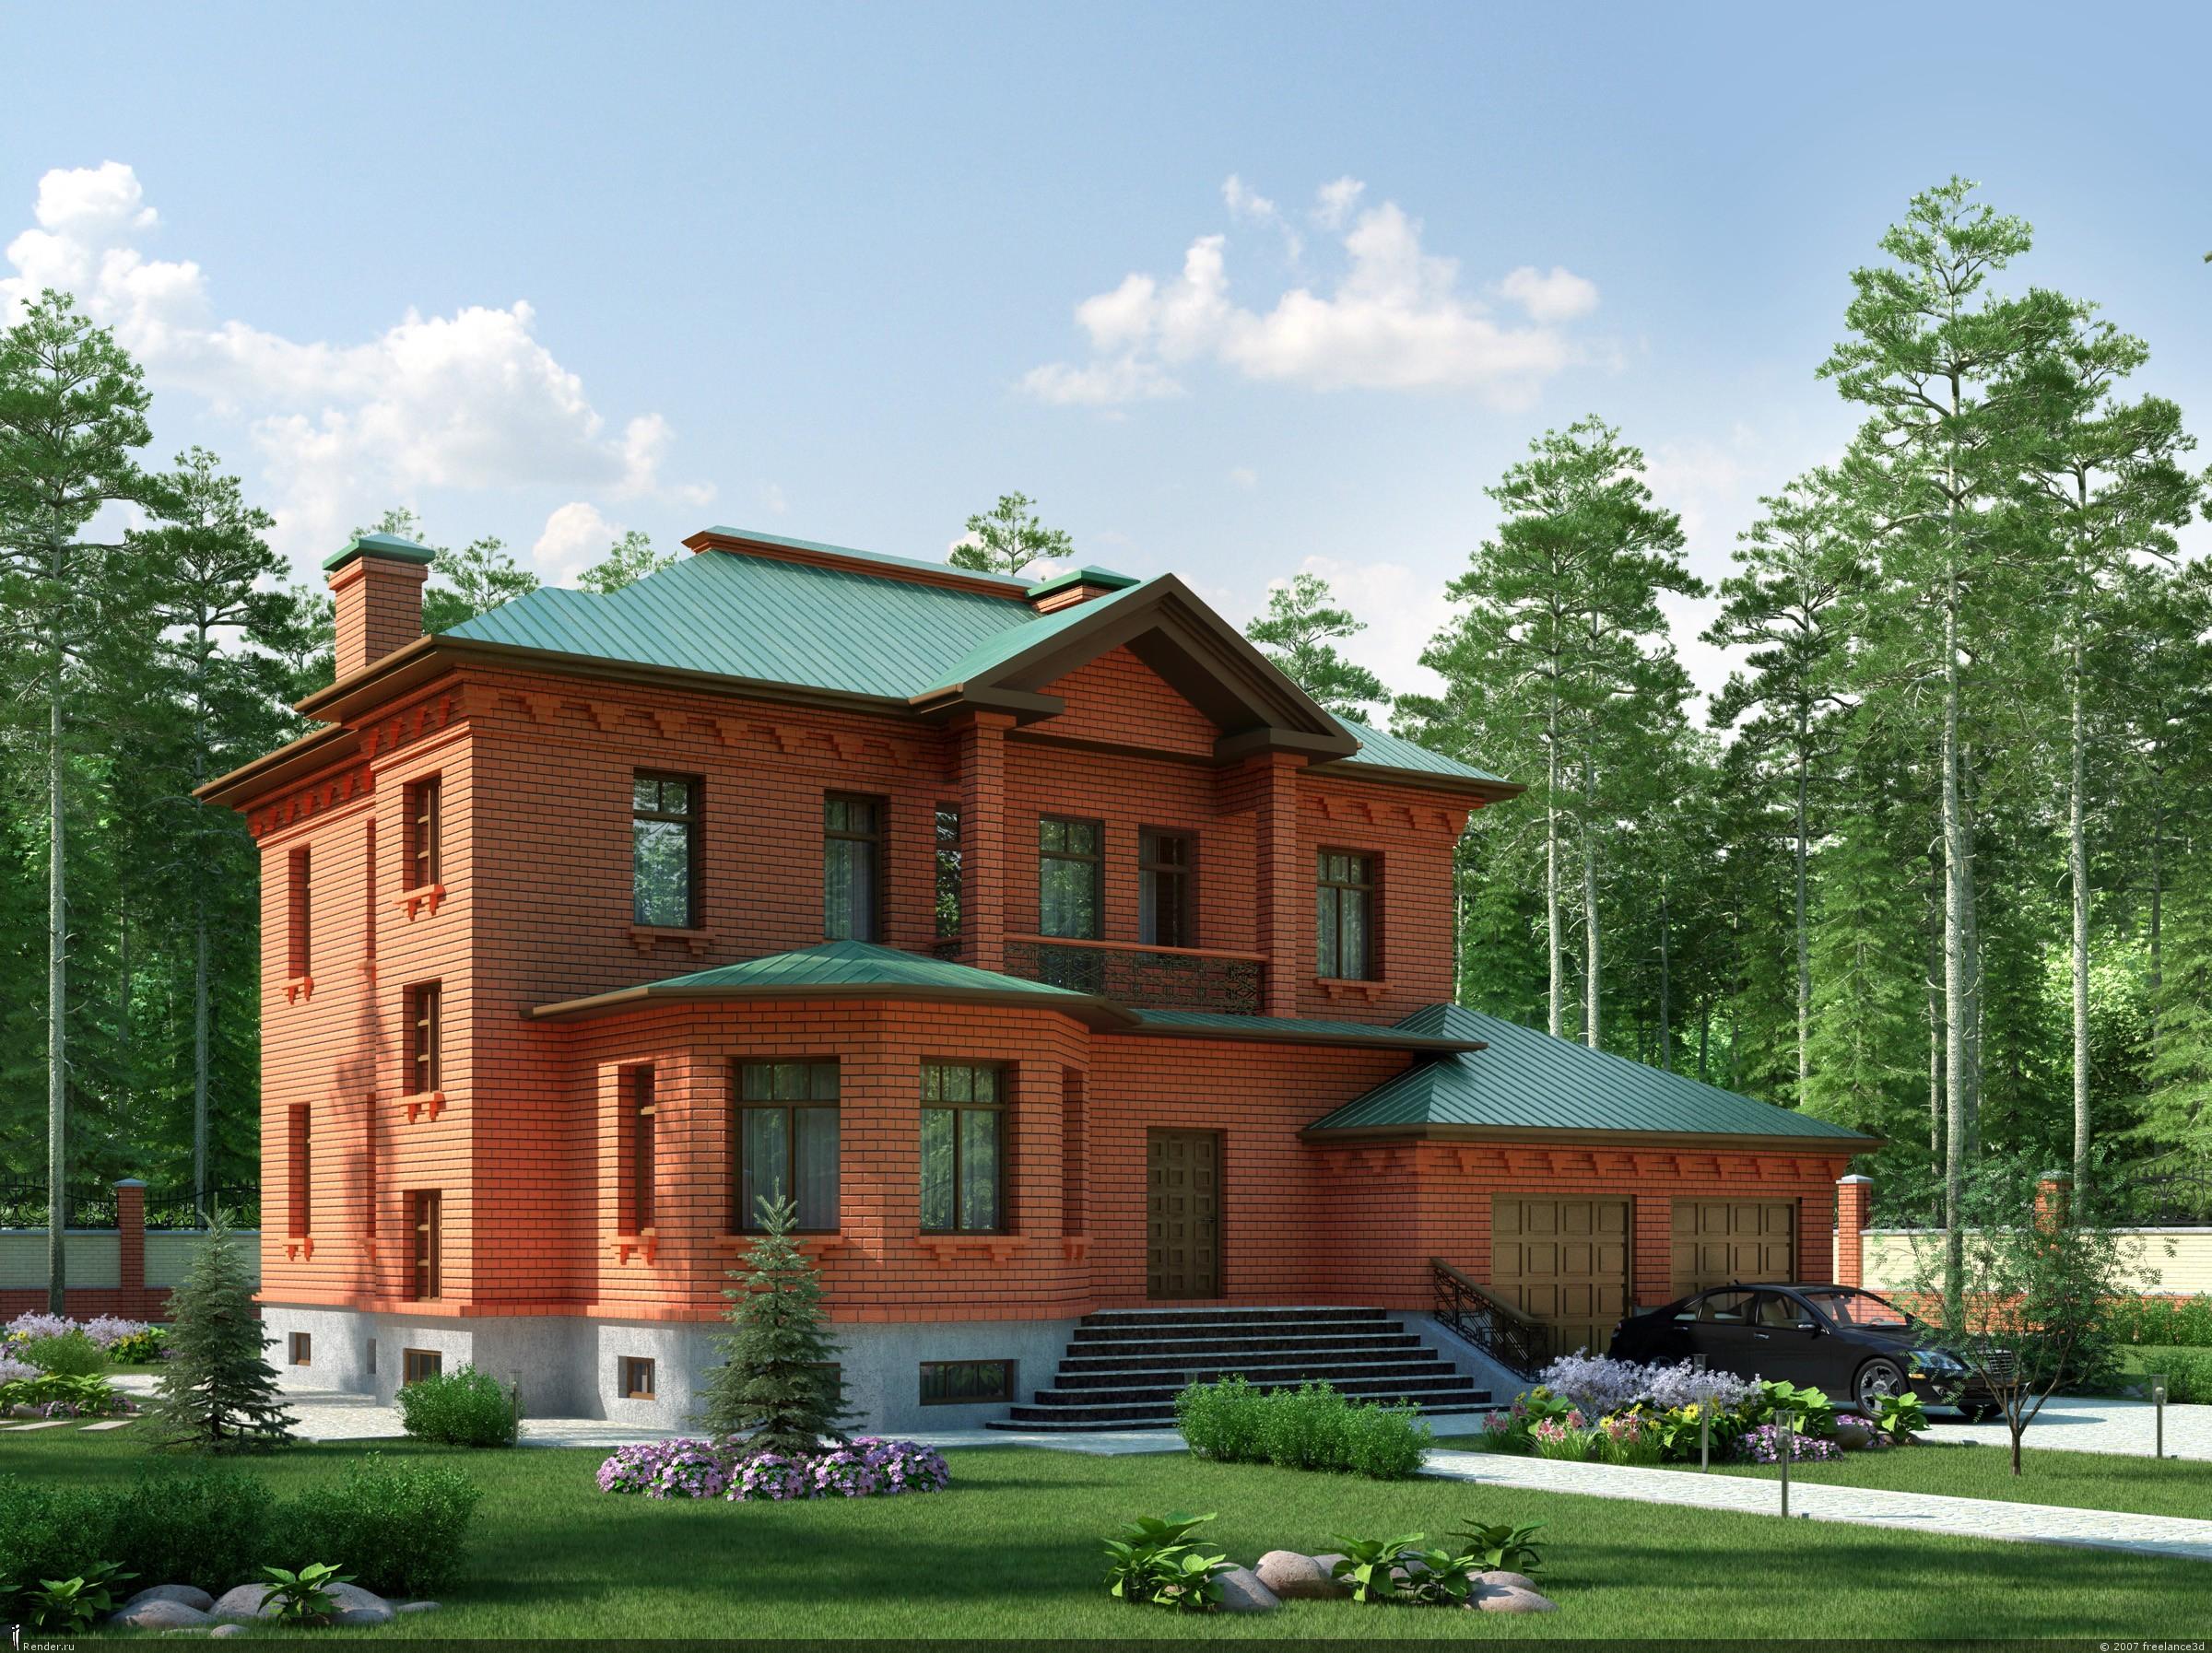 Casas dise adas en 3d for Decorar casas online 3d